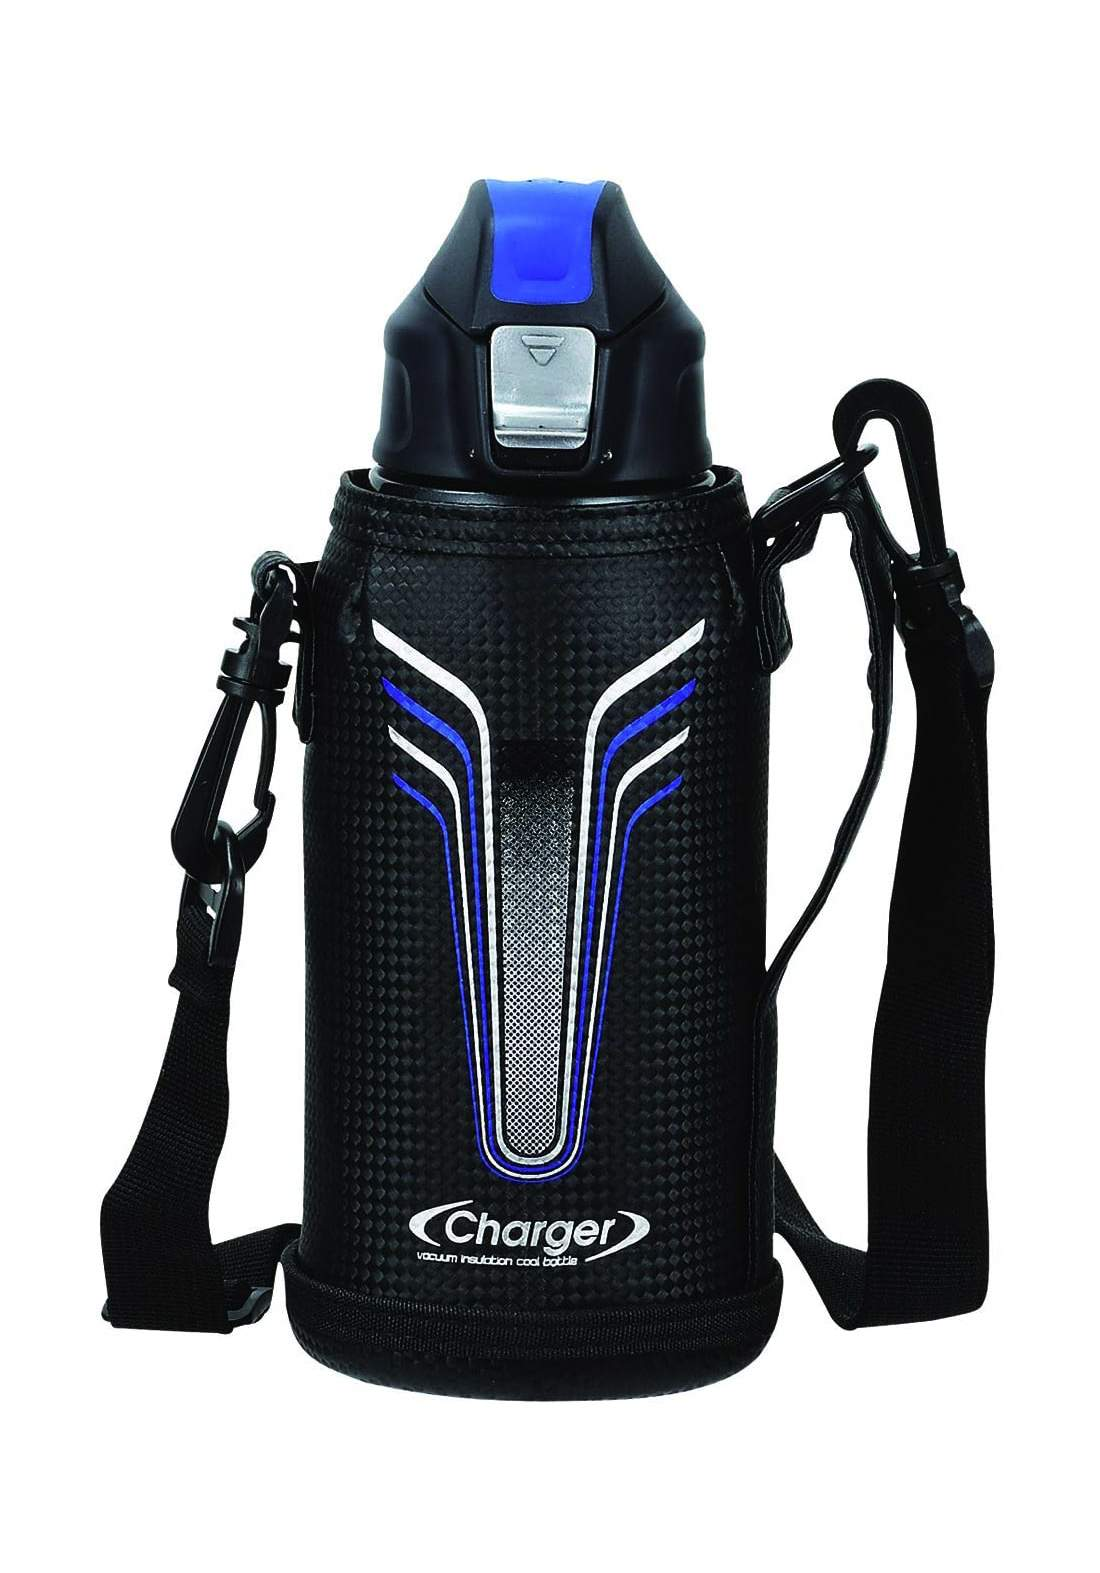 Pearl Metal HB-5248 Charger Neo Direct Bottle 800 ml with pouch حافظة للمشروبات الباردة